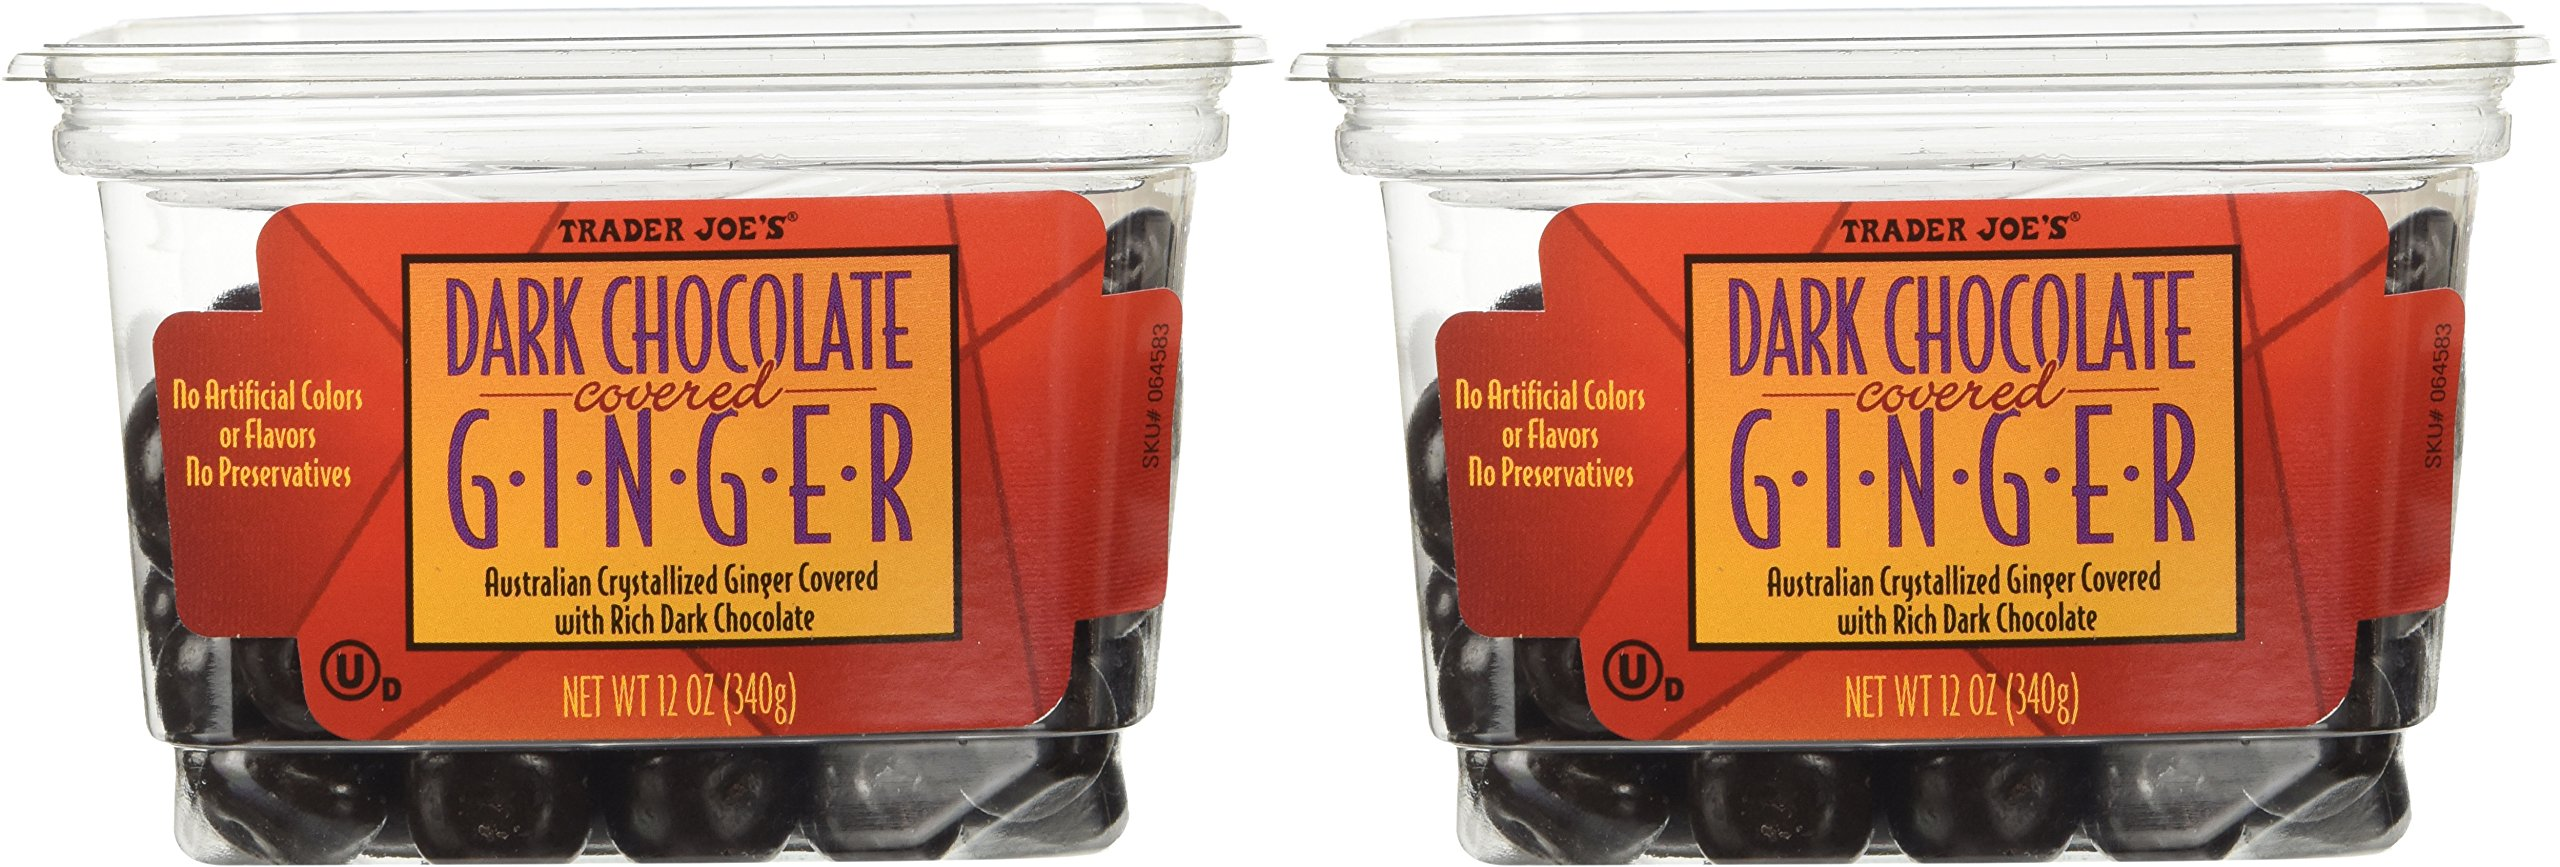 Trader Joe's Dark Chocolate Covered Ginger - 2 Pack